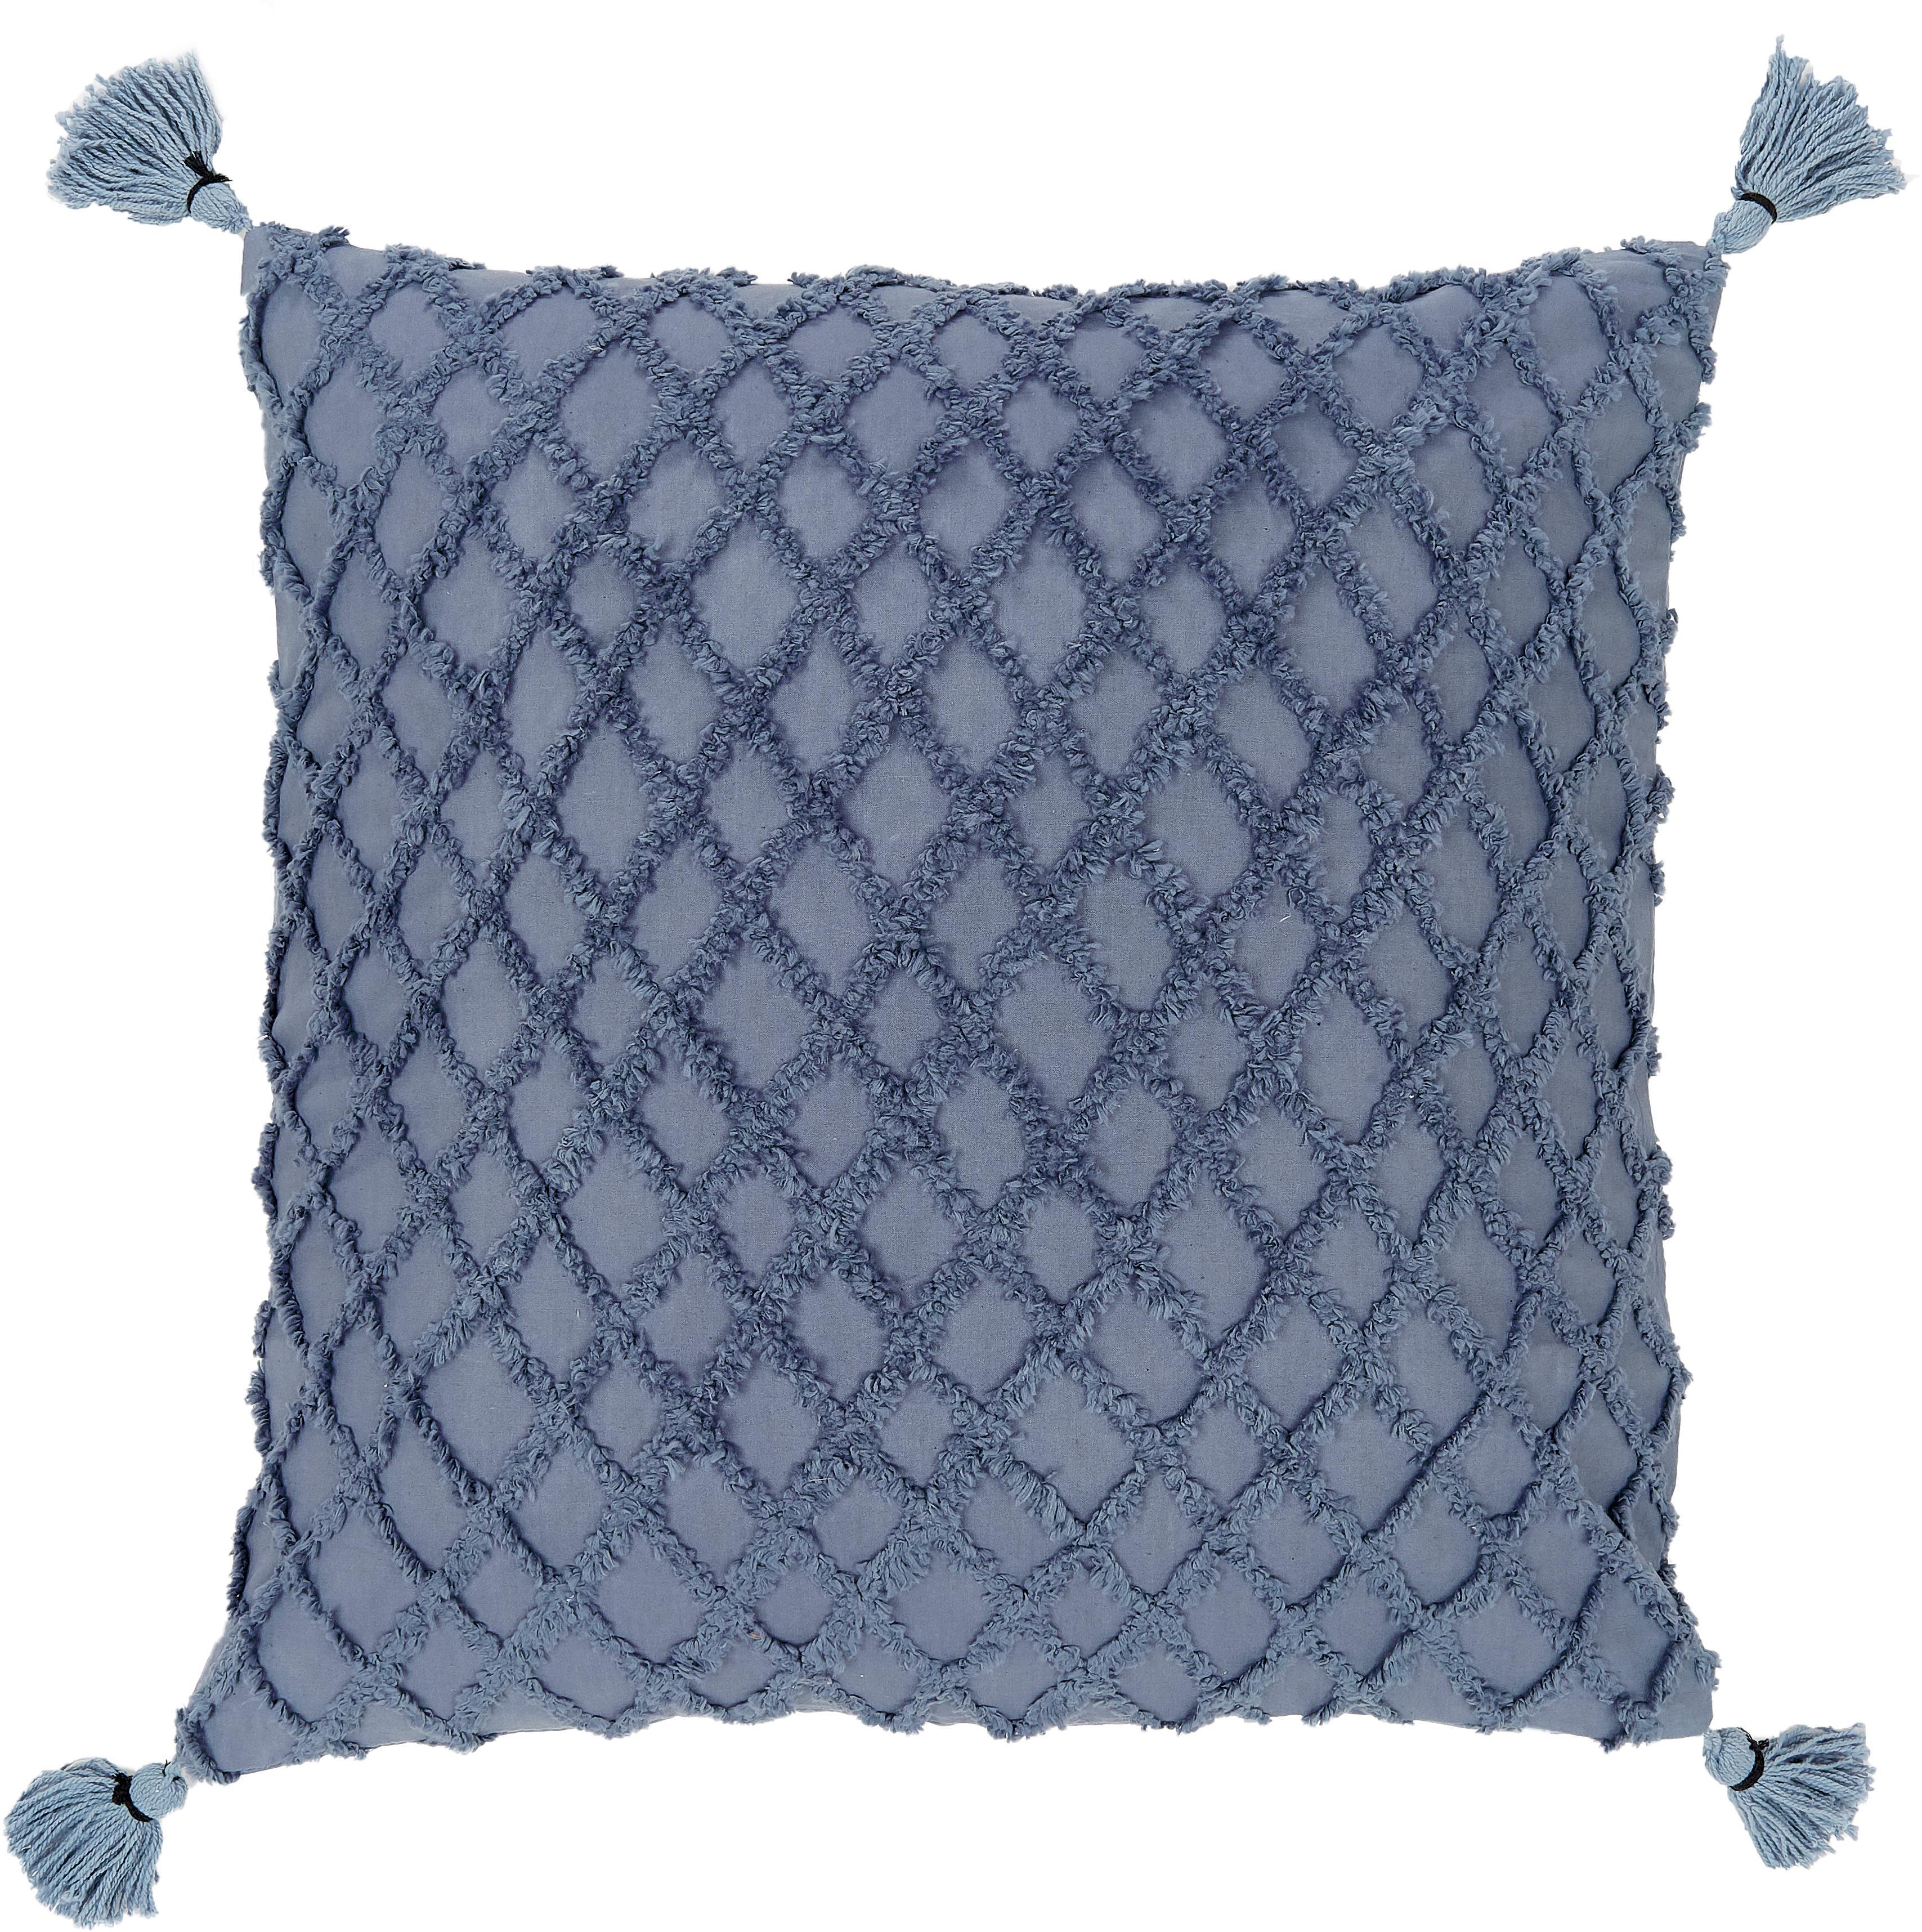 Funda de cojín Royal, Algodón, Azul, An 45 x L 45 cm